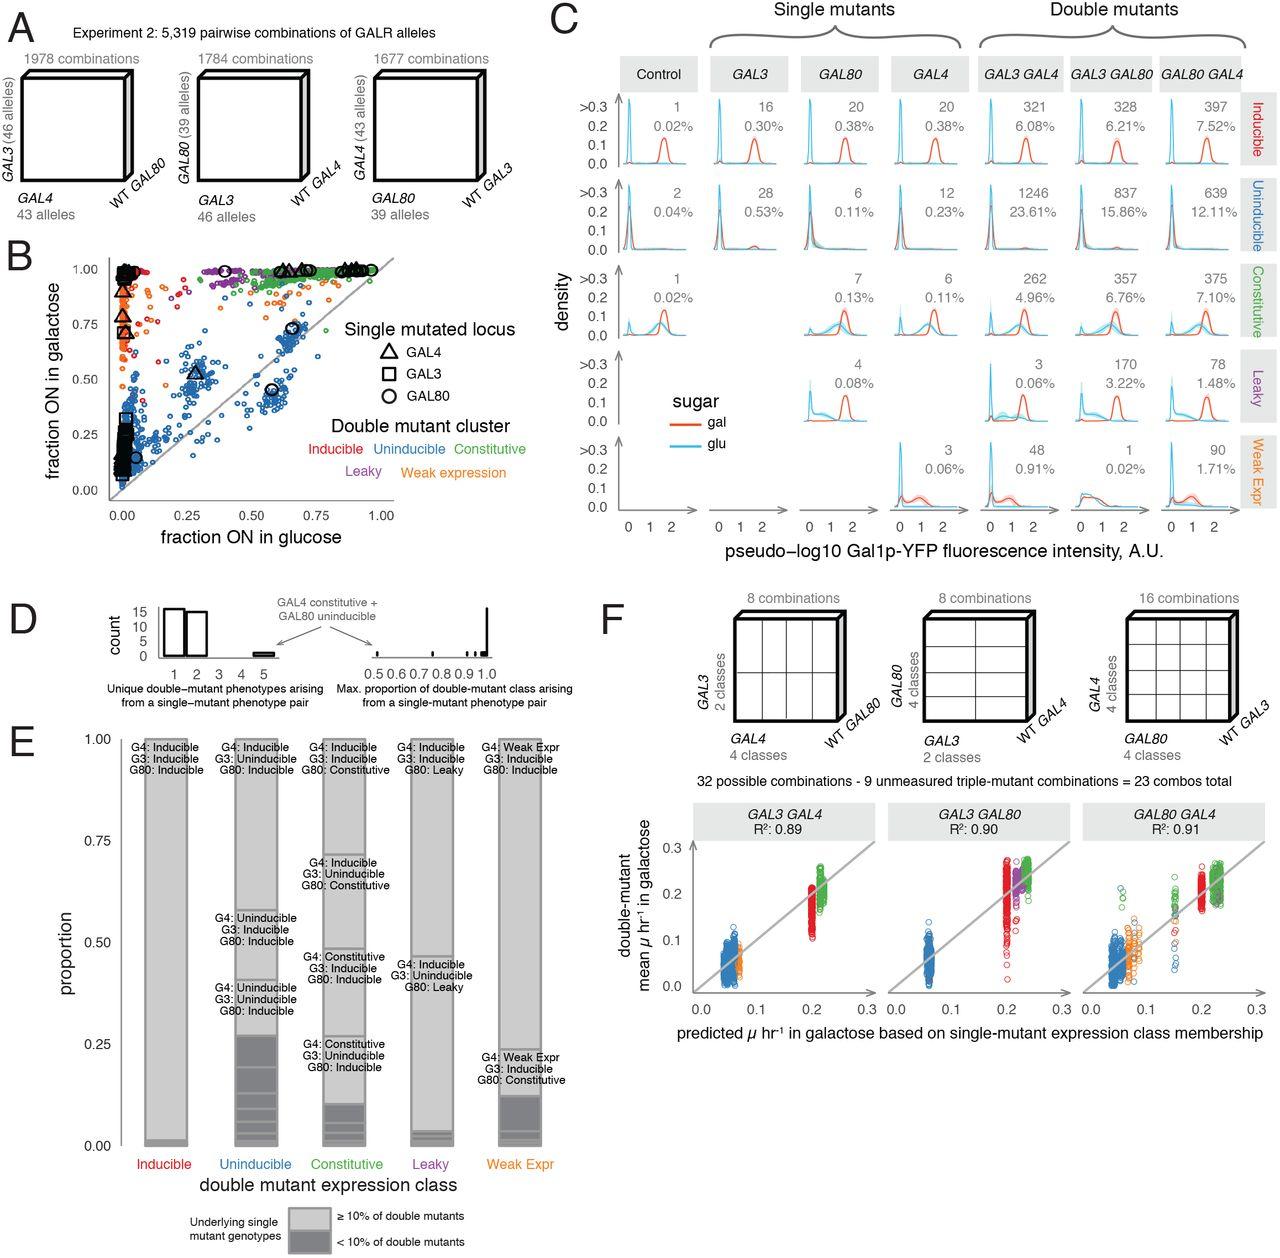 Harmonious Genetic Combinations Rewire Regulatory Networks And Flip Gene Essentiality Biorxiv